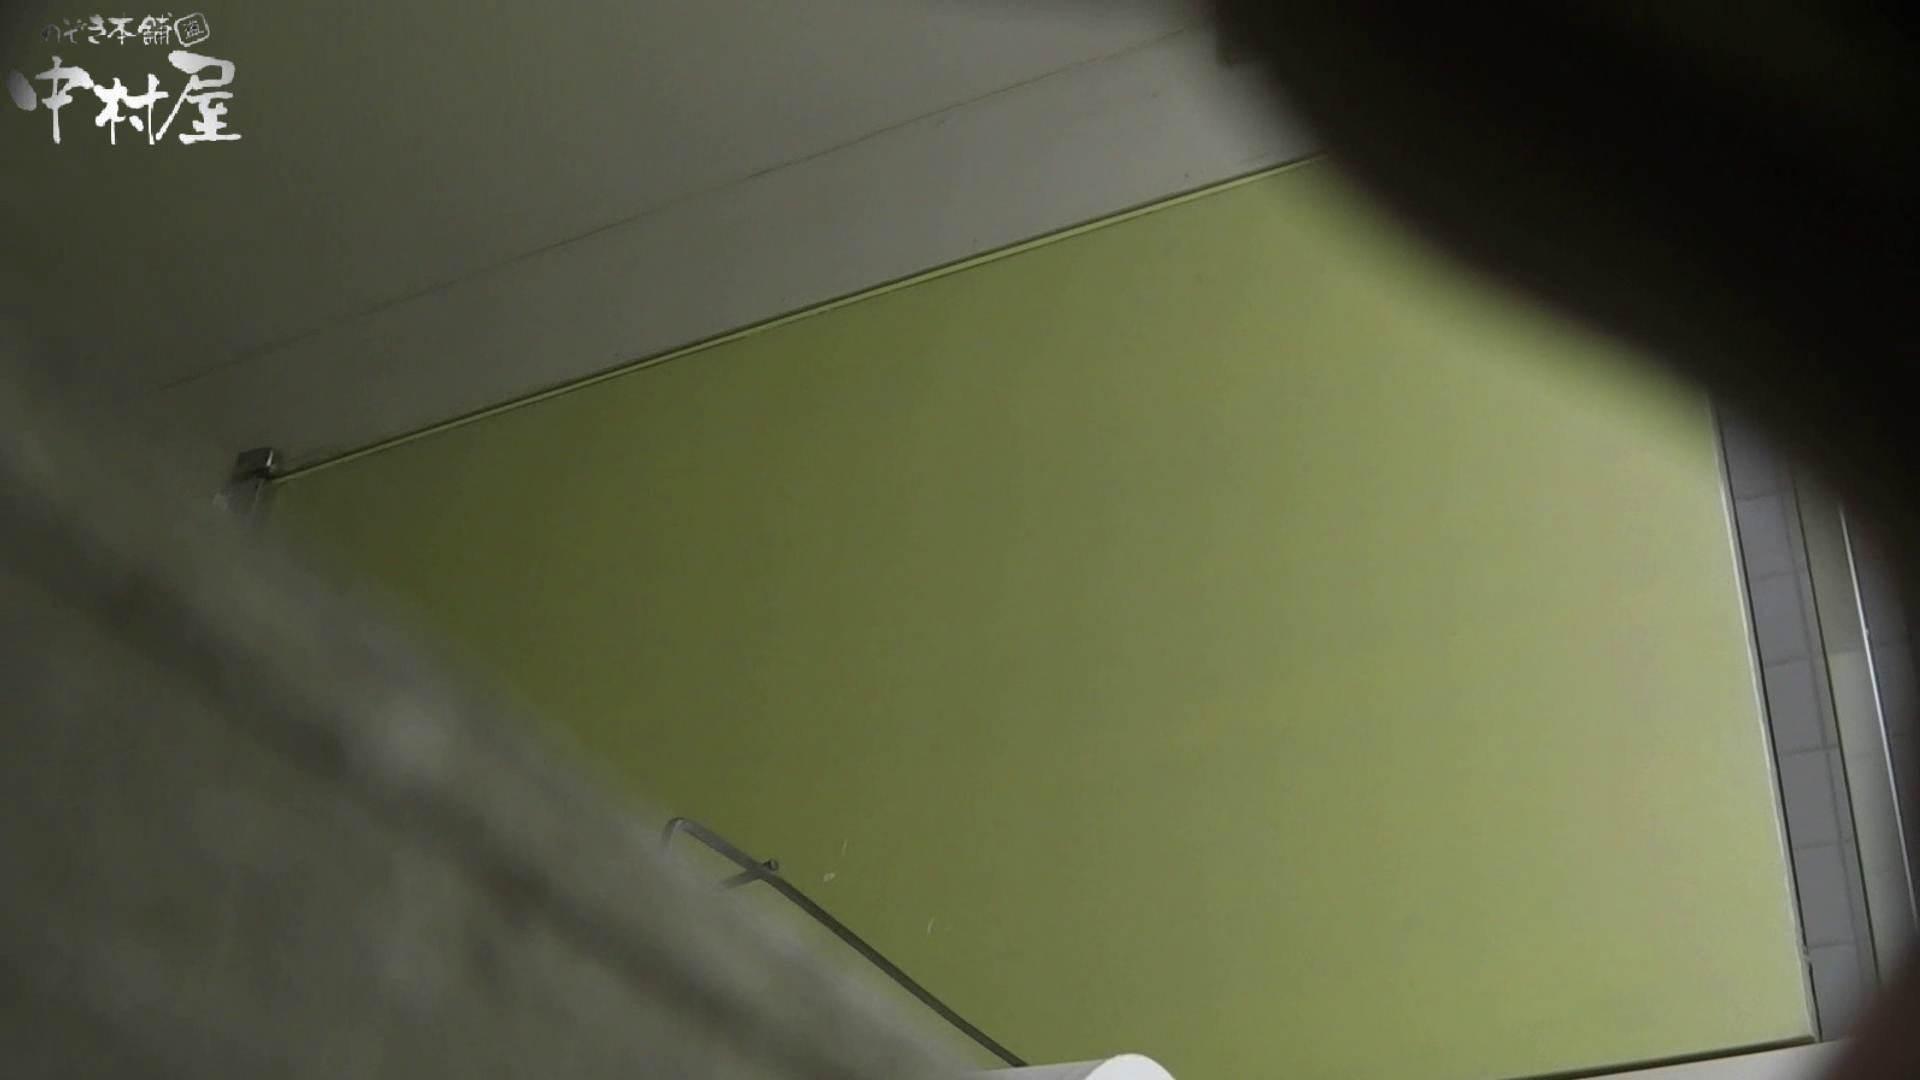 vol.25 命がけ潜伏洗面所! 咥えタオルは剛毛の証!?後編 プライベート  33連発 12